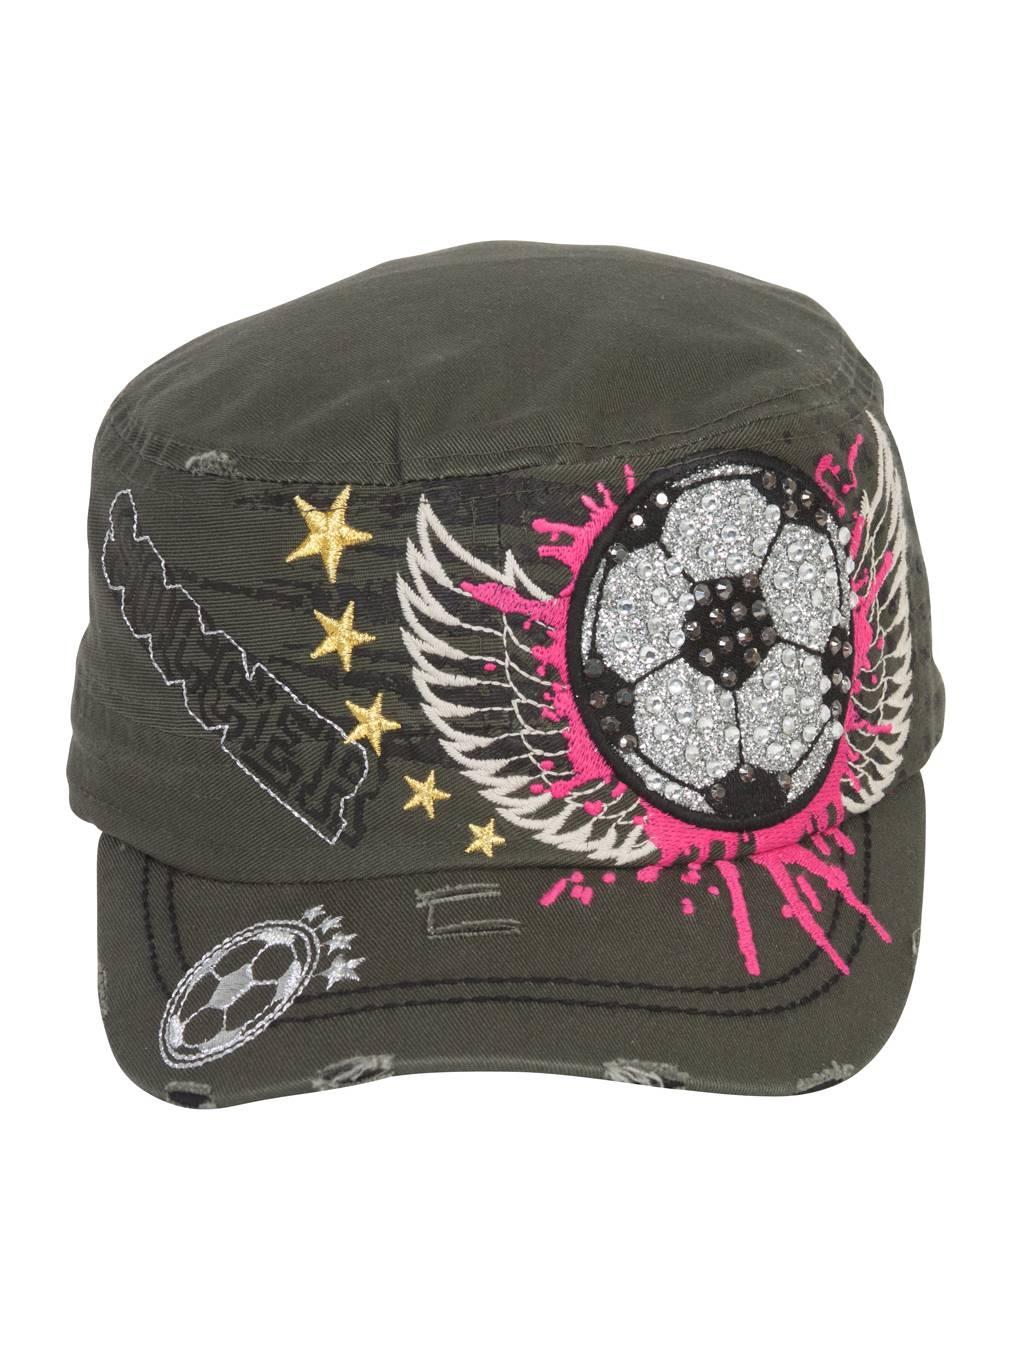 TopHeadwear Winged Soccer Ball Distressed Cadet Cap - Olive 387f9d72fcb